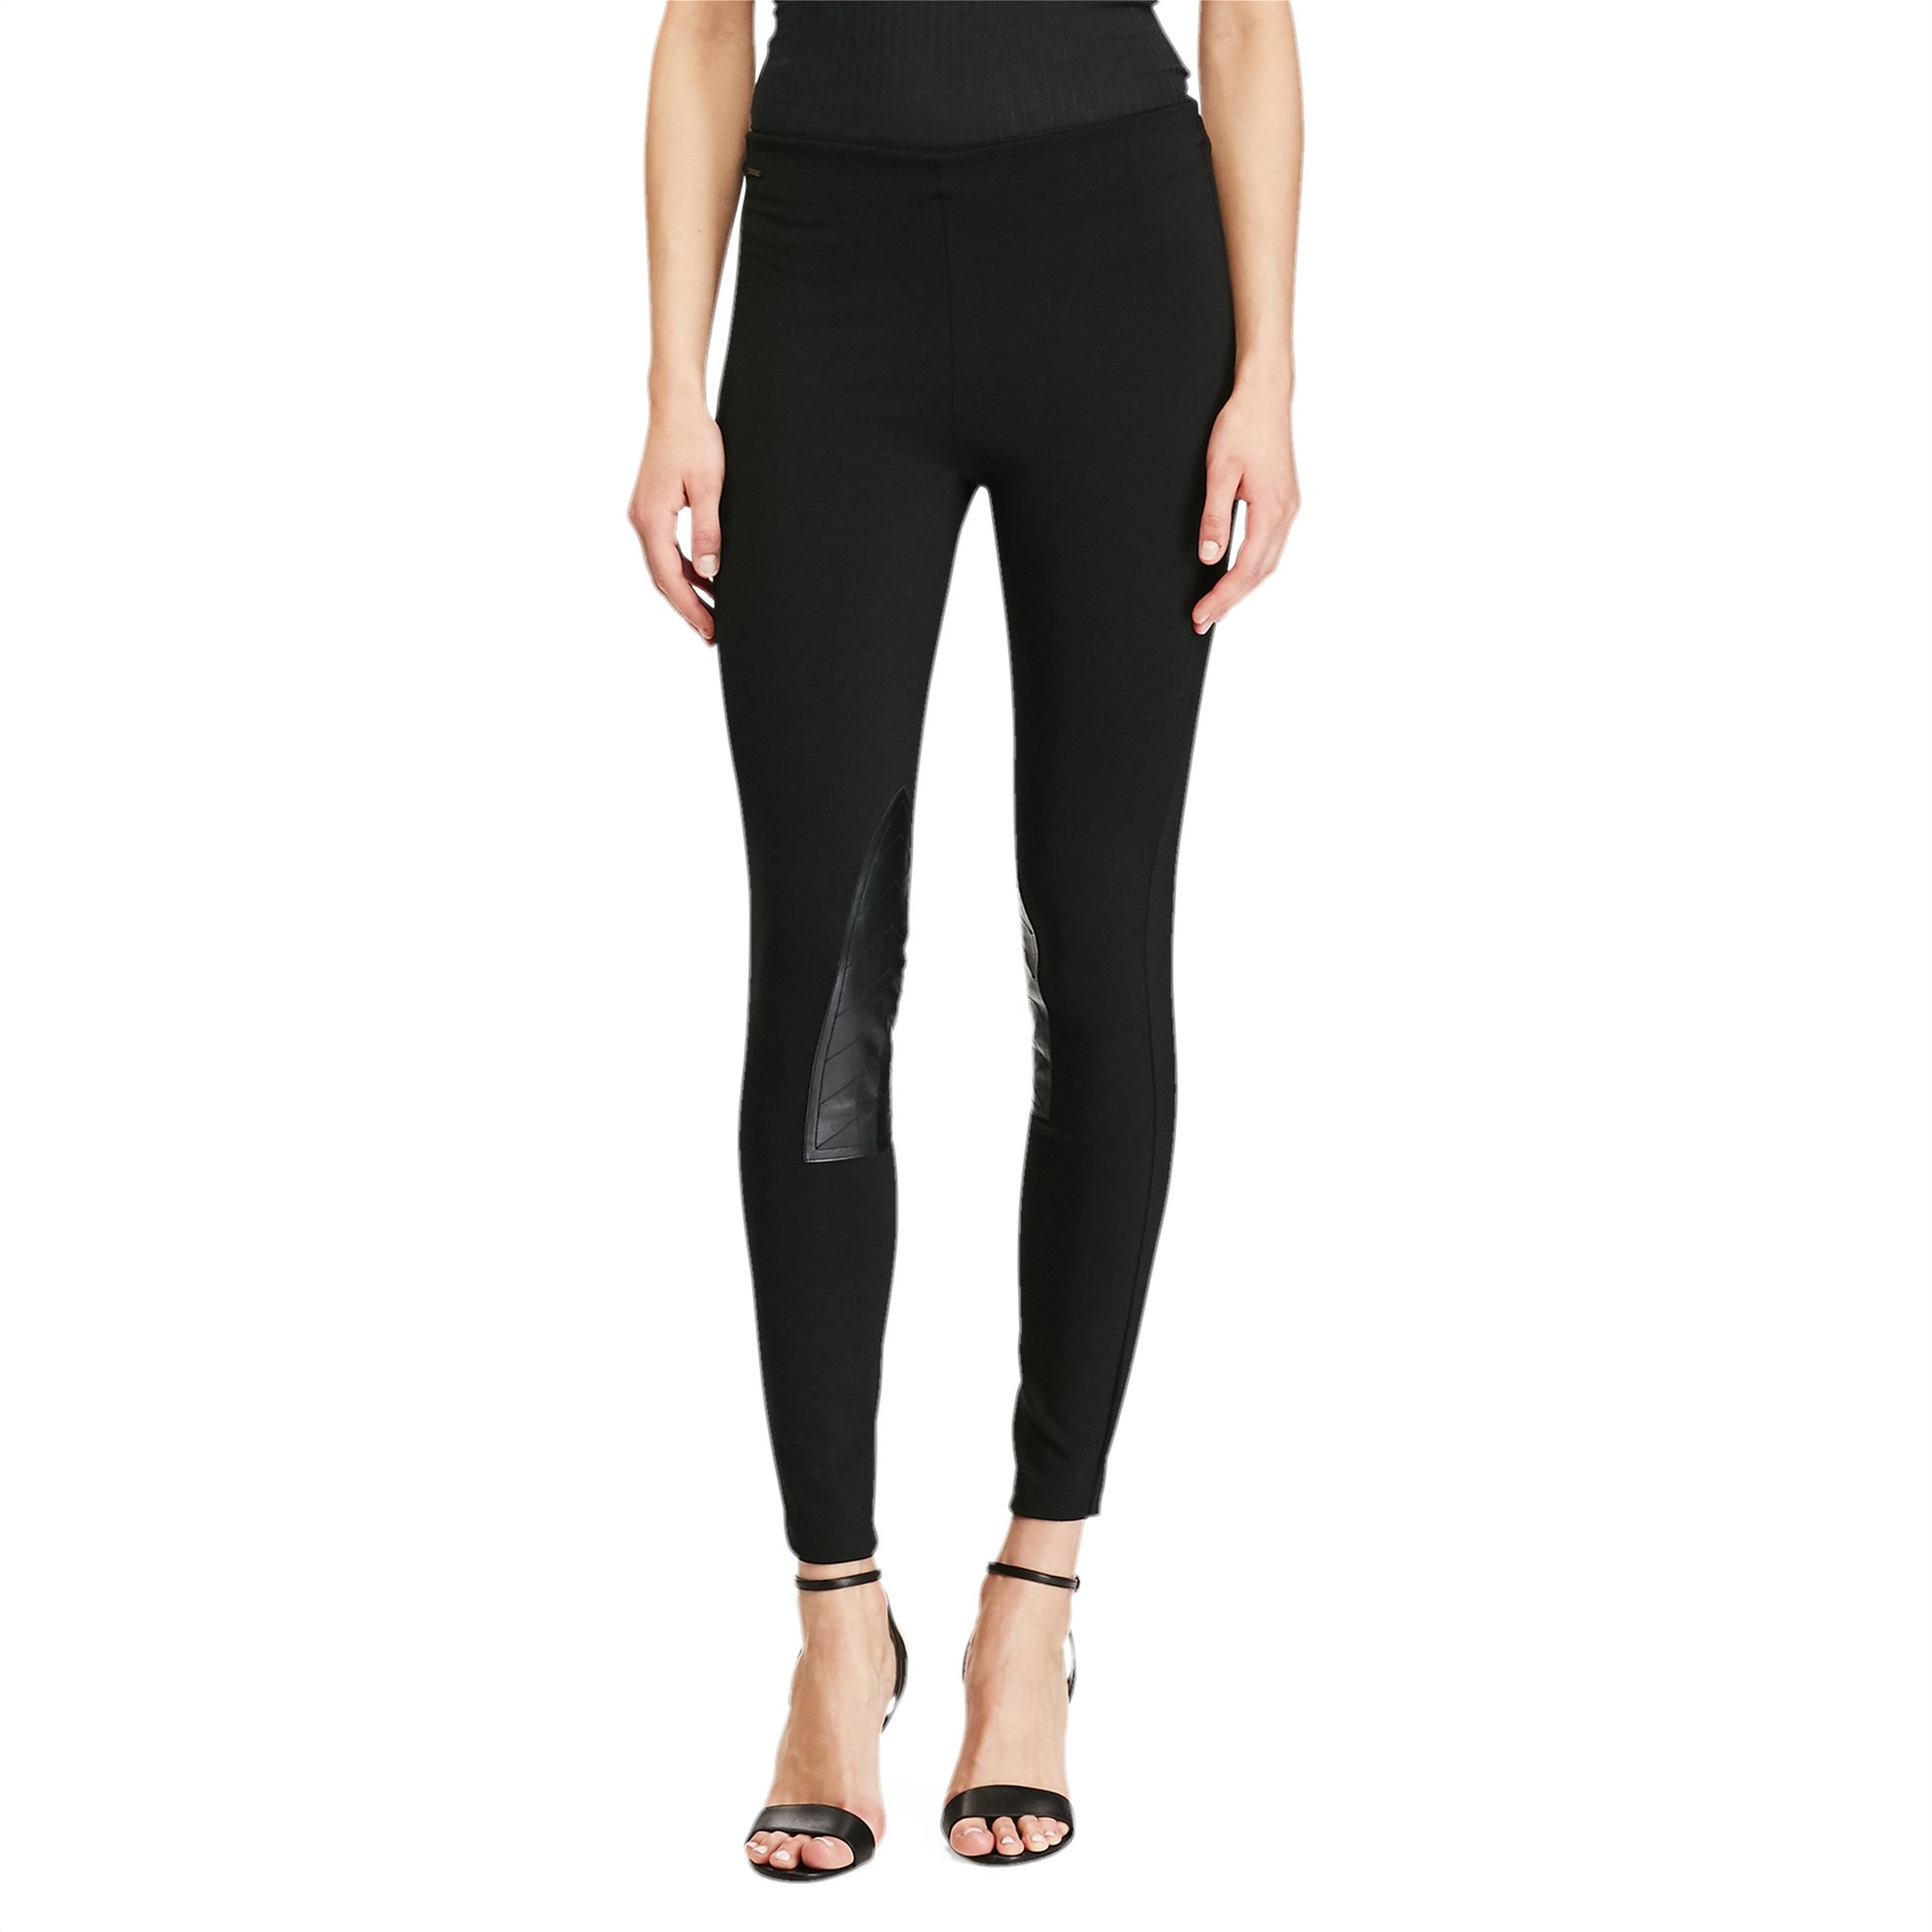 Polo Ralph Lauren γυναικείο παντελόνι-κολάν Jodhpur Stretch Skinny Trouser - 211 γυναικα   ρουχα   παντελόνια   κολάν